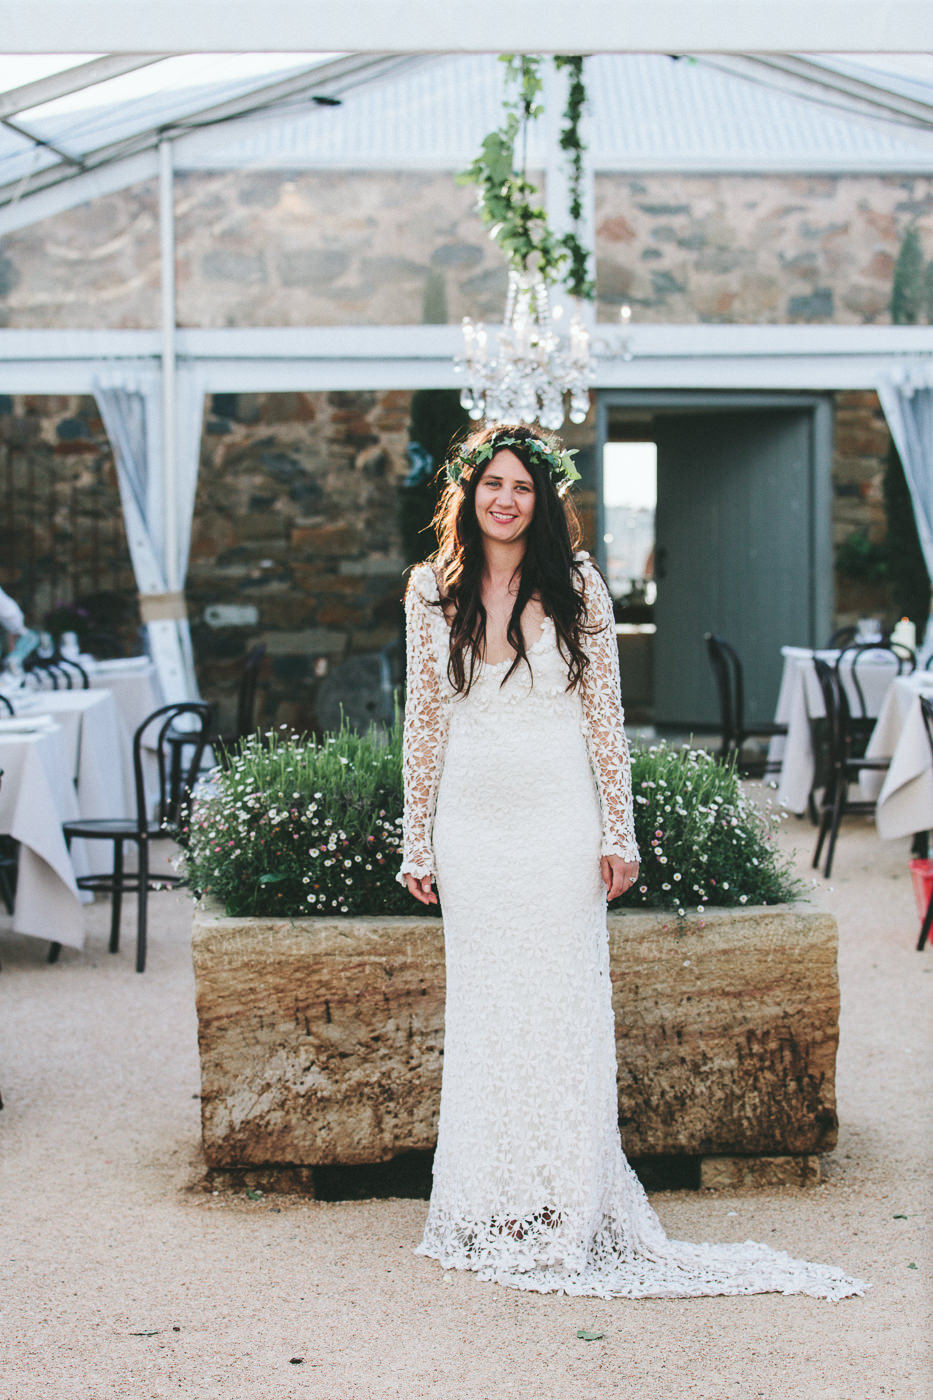 Bride in the reception marquee